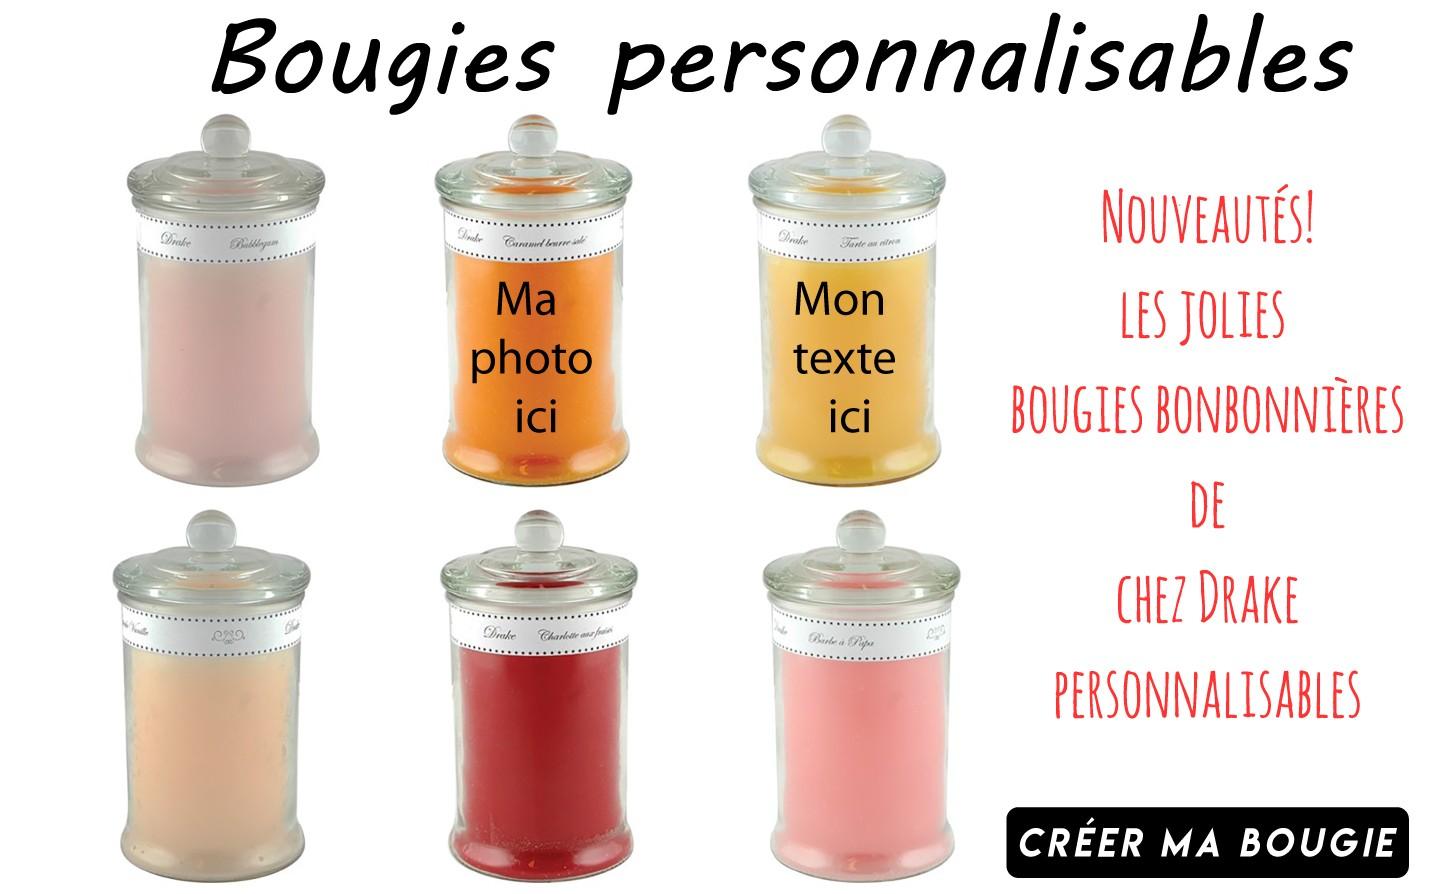 Bougies personnalisables